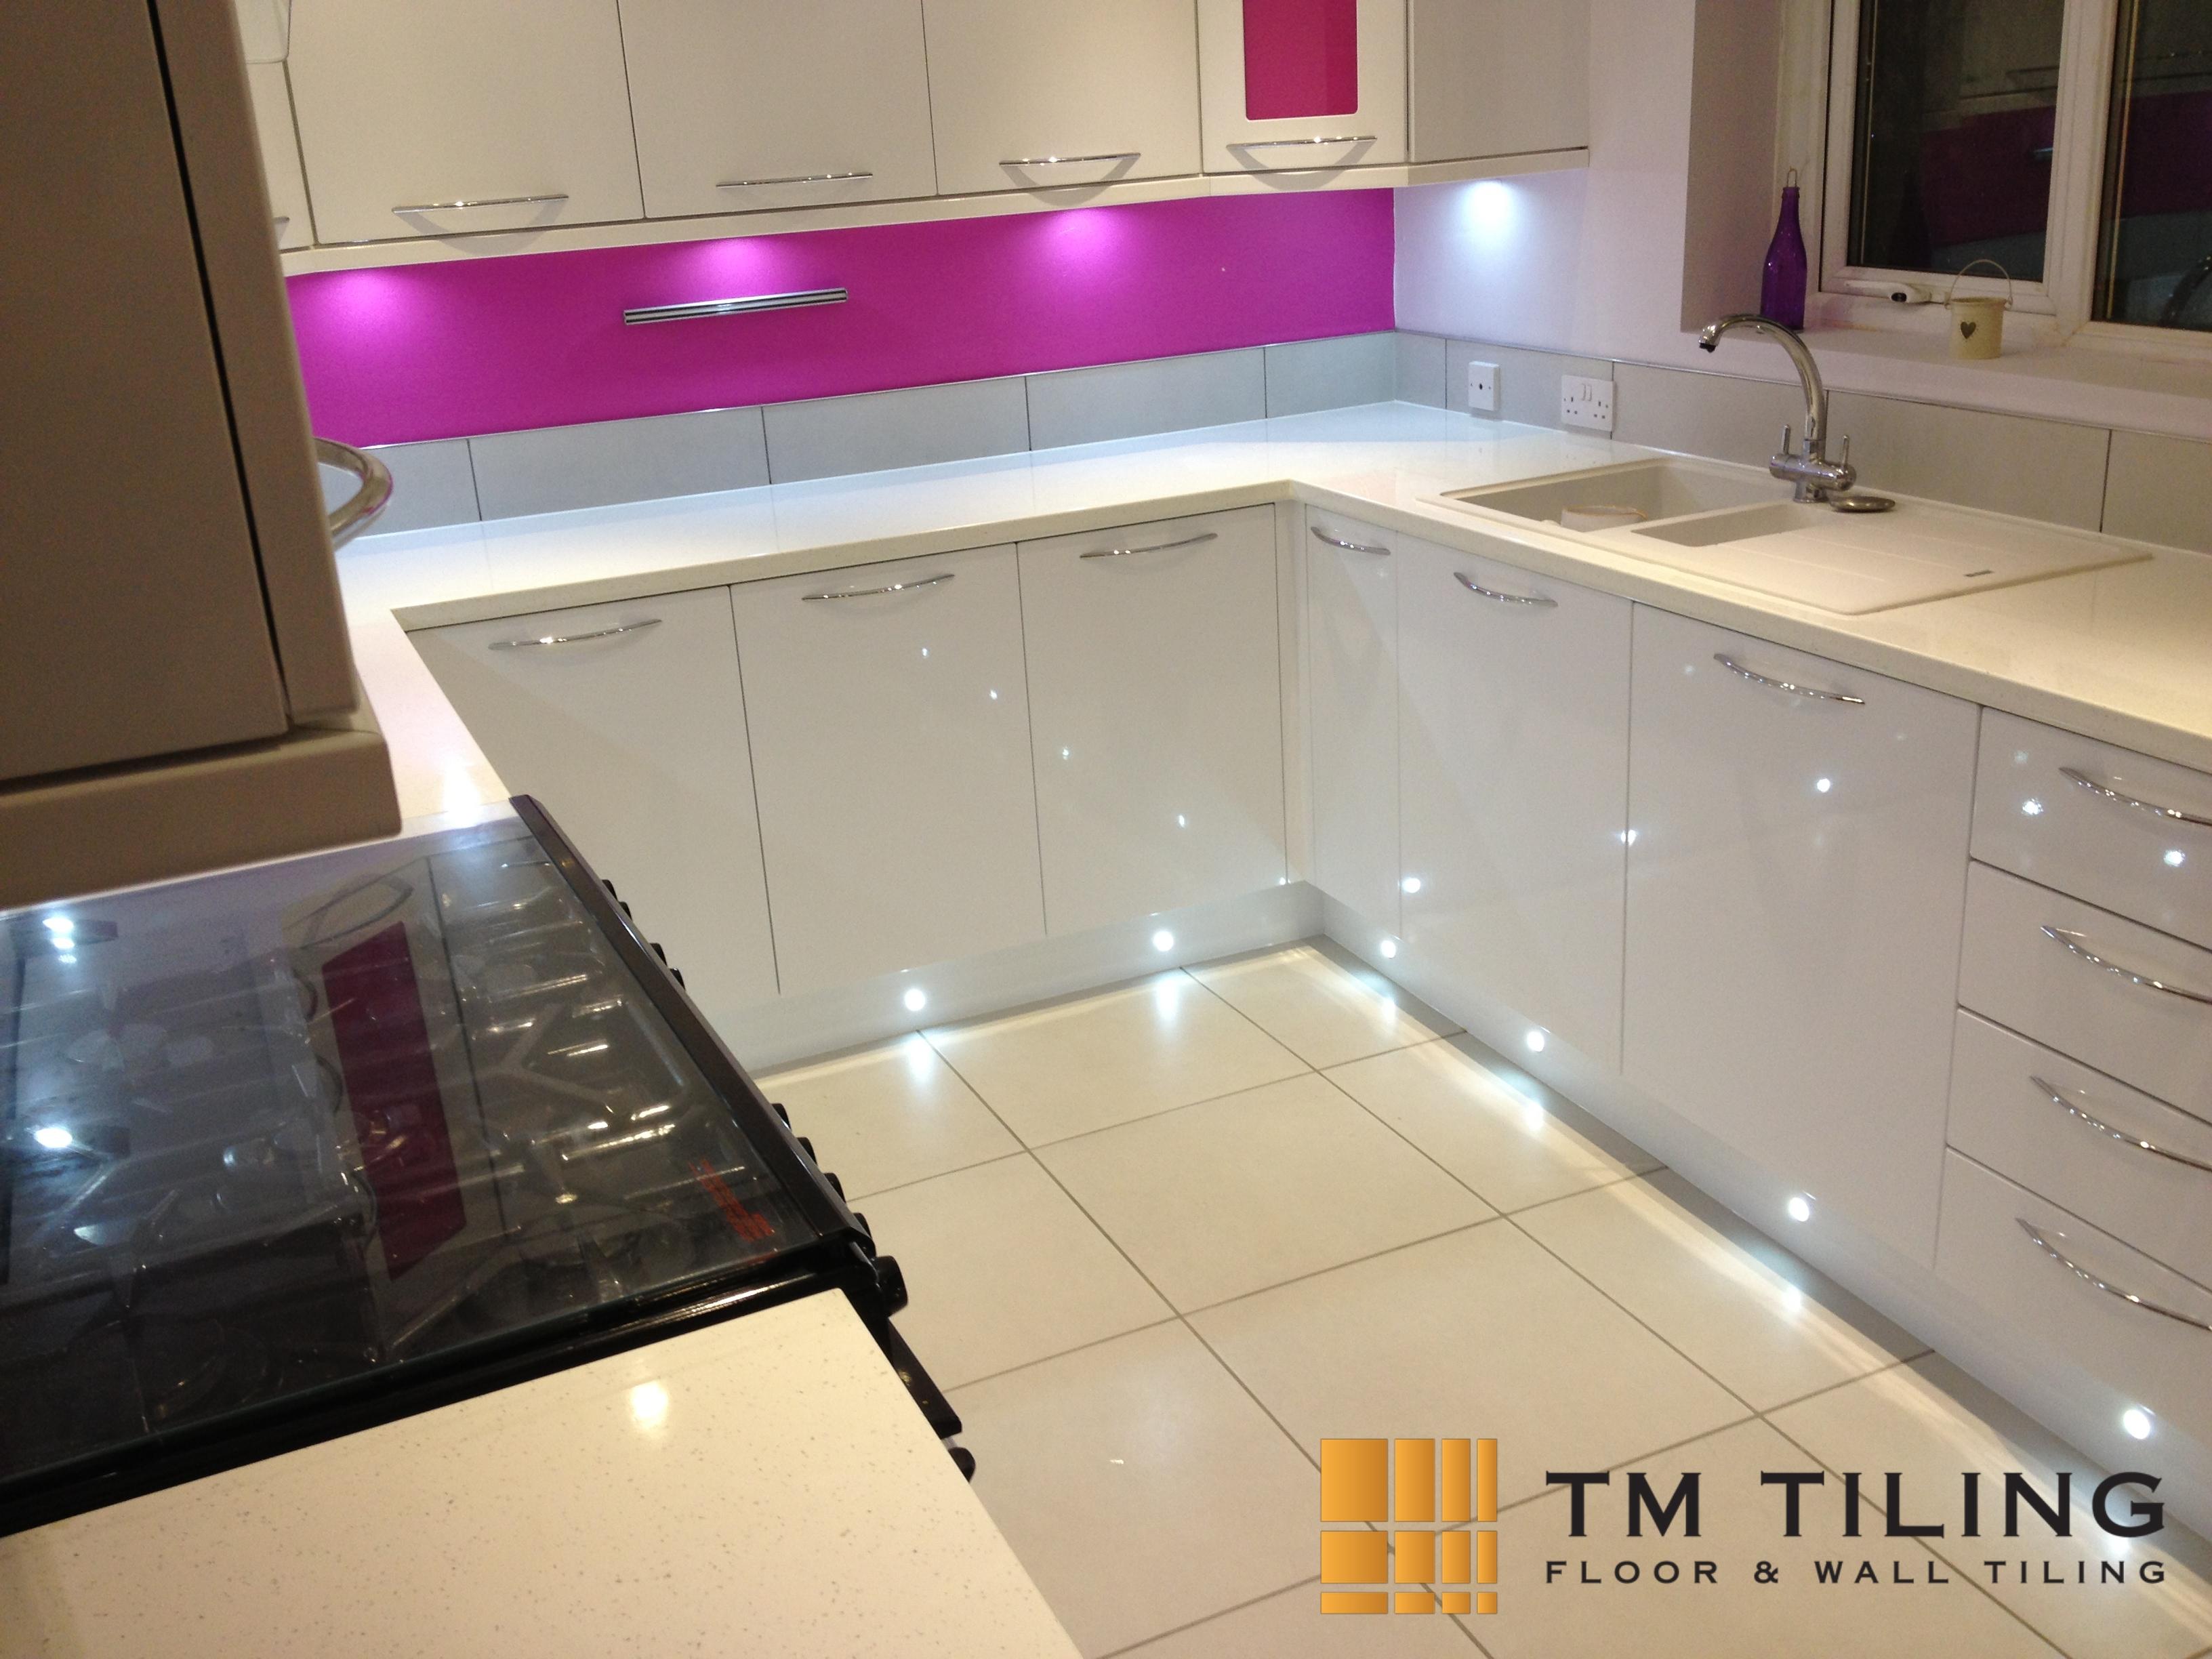 kitchen-tiles-tile-installation-renovation-tm-tiling-singapore_wm